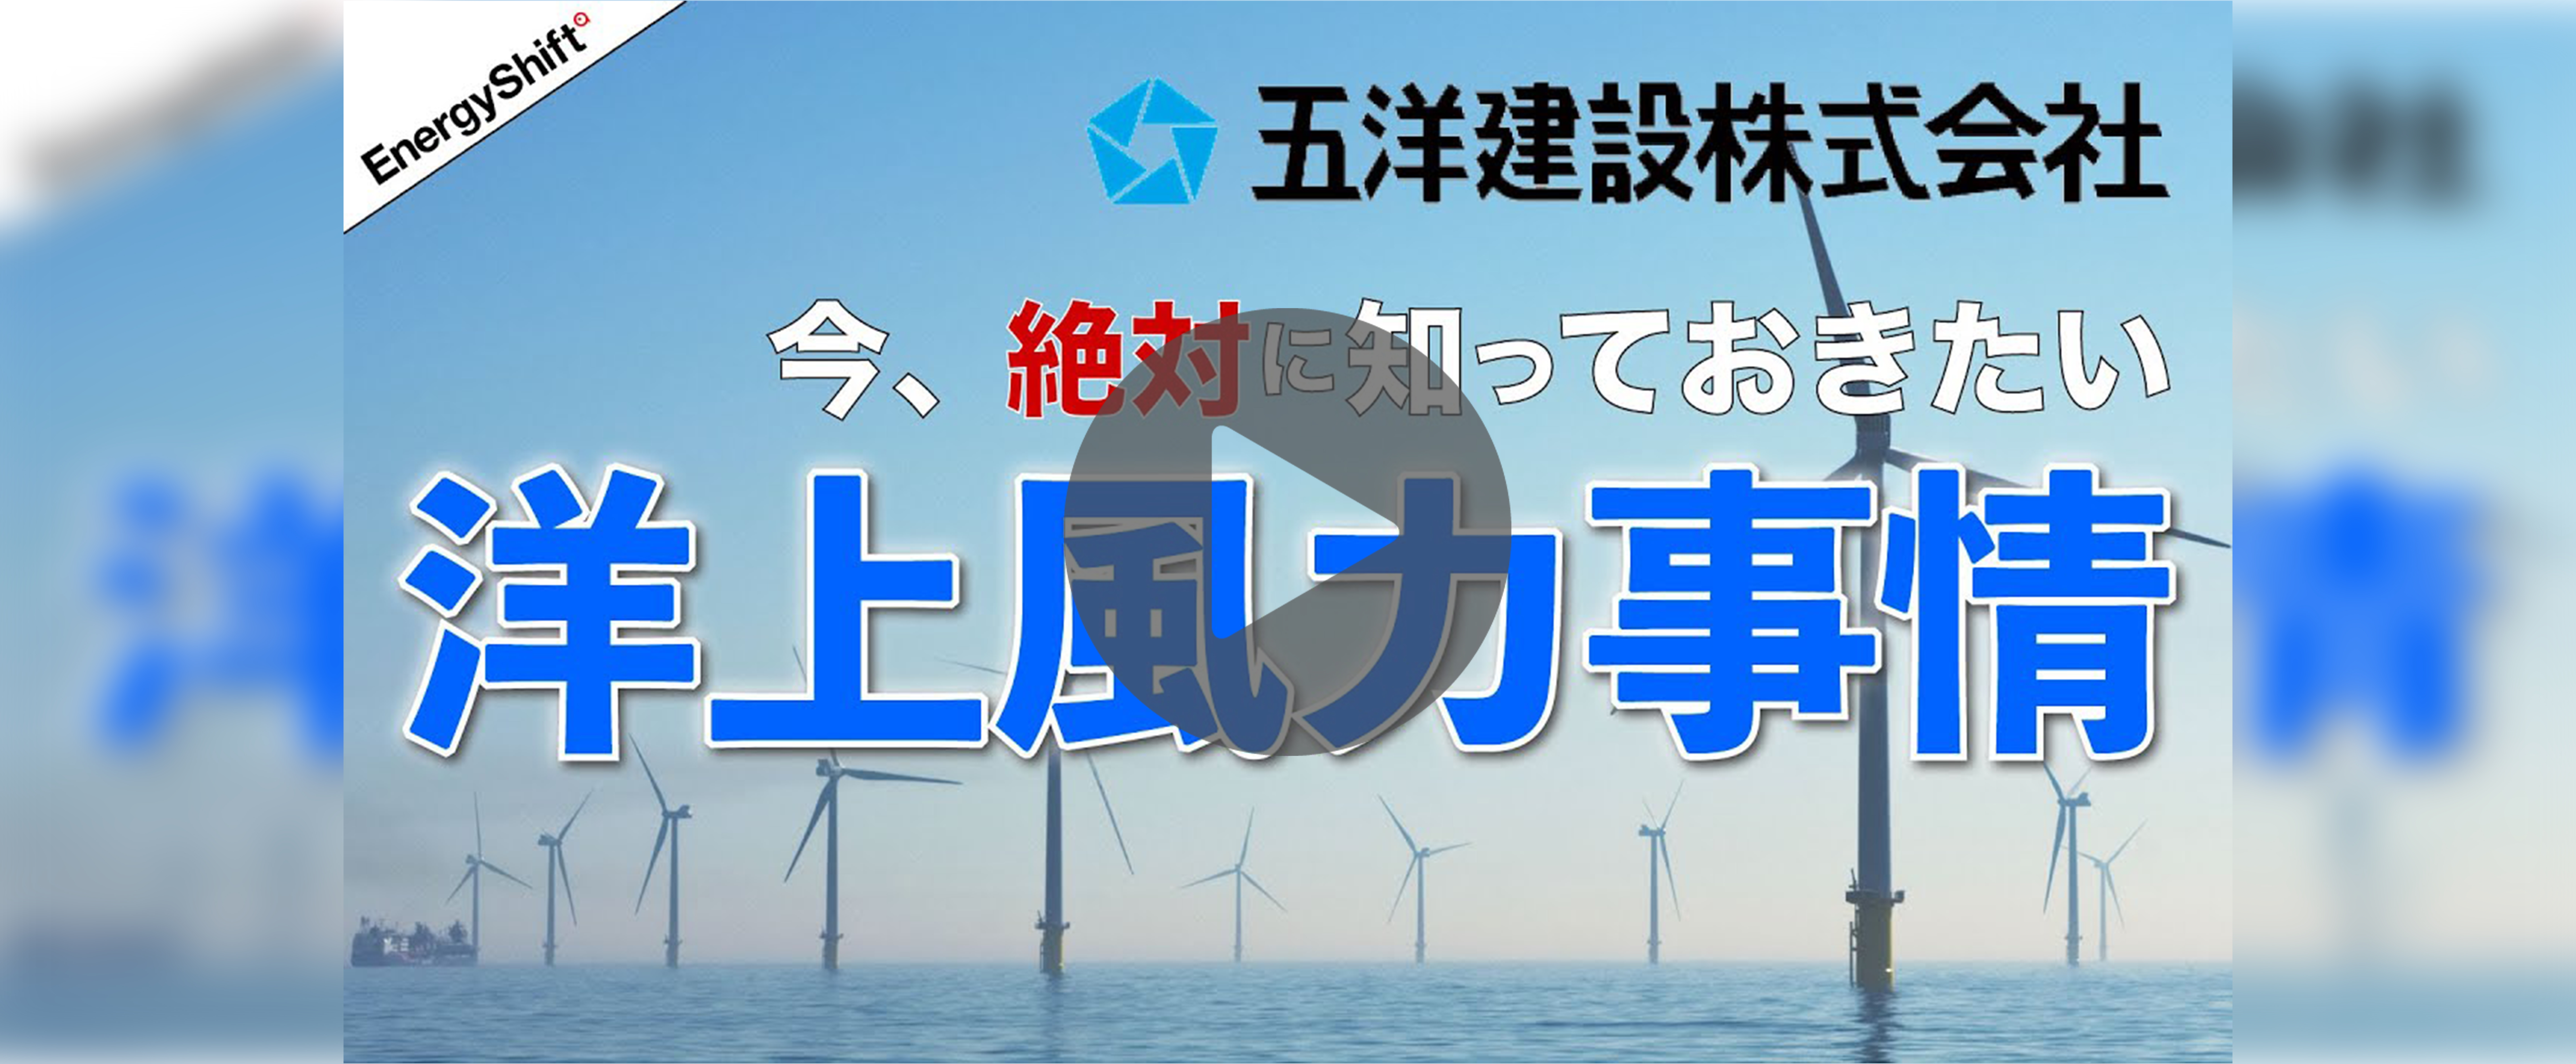 【YouTube】五洋建設 今、絶対に知っておきたい洋上風力事情